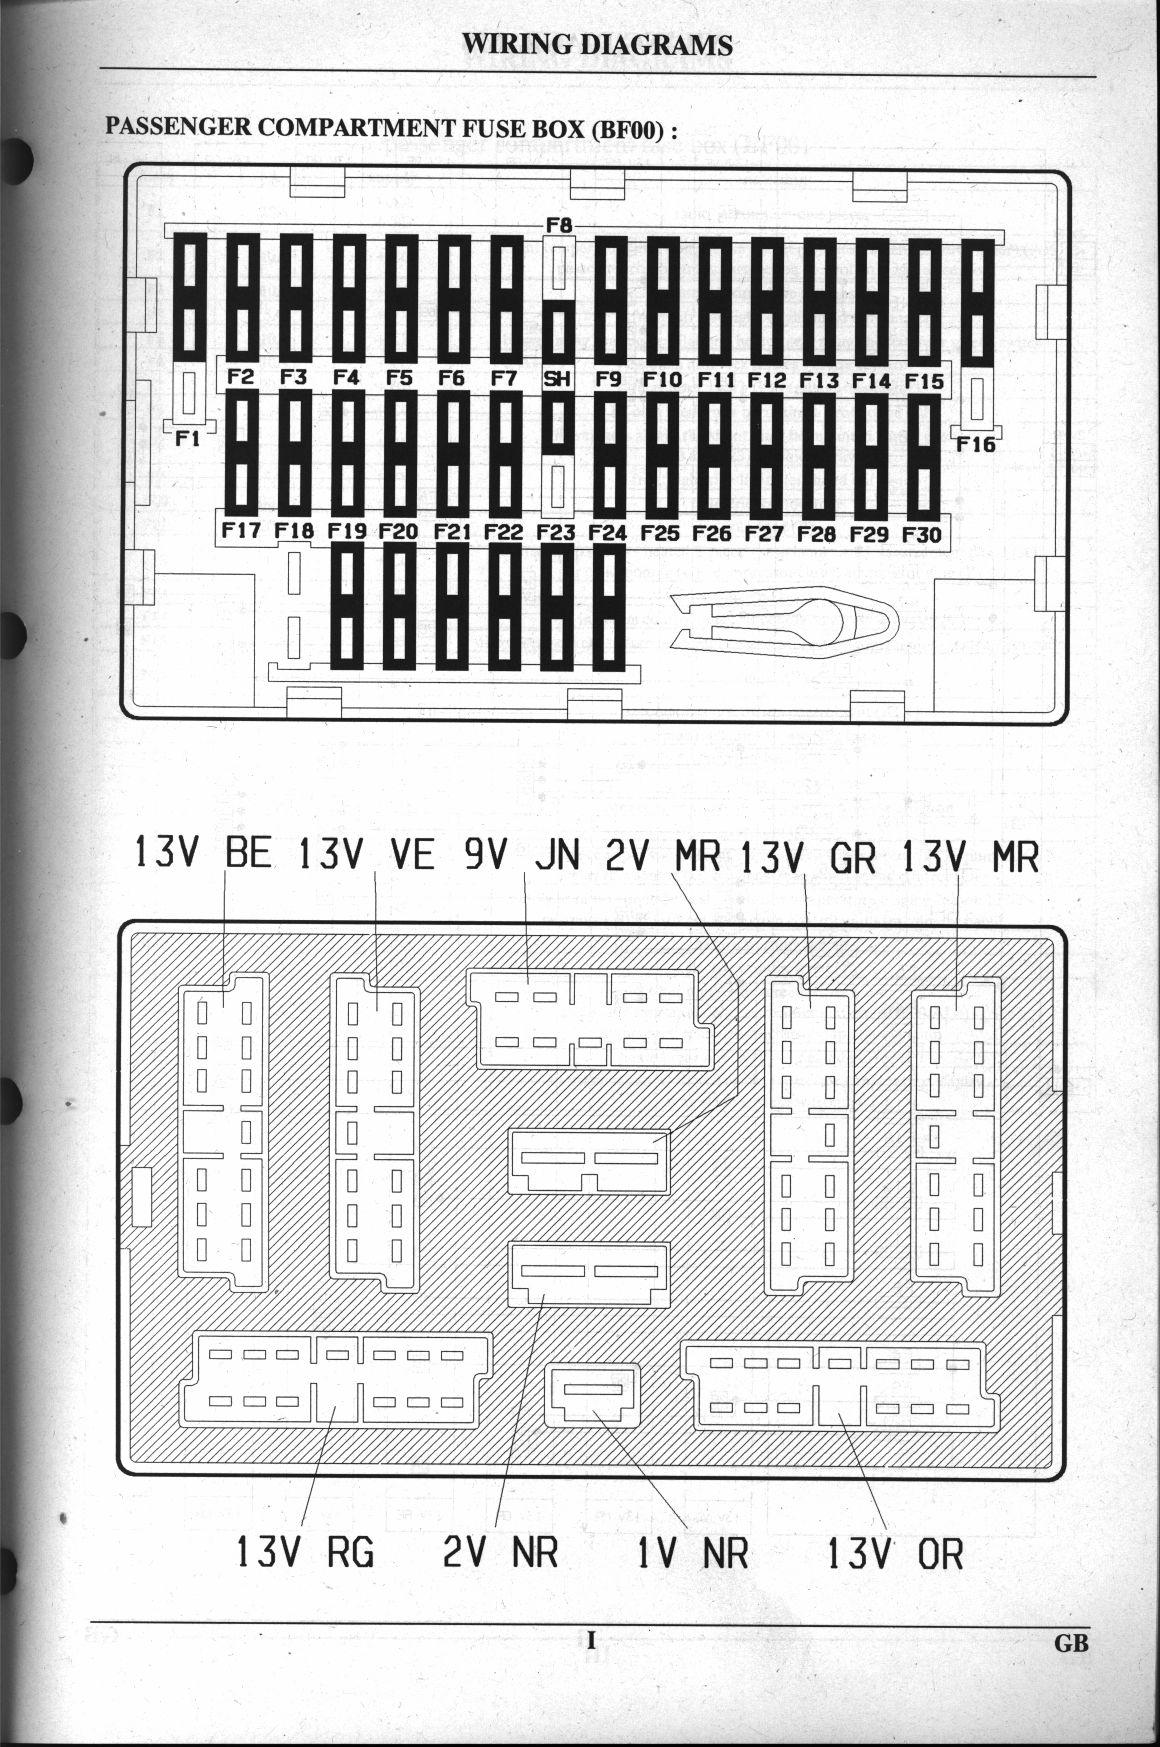 Marvelous Citroen Saxo Vtr Fuse Box Diagram General Wiring Diagram Data Wiring Cloud Philuggs Outletorg